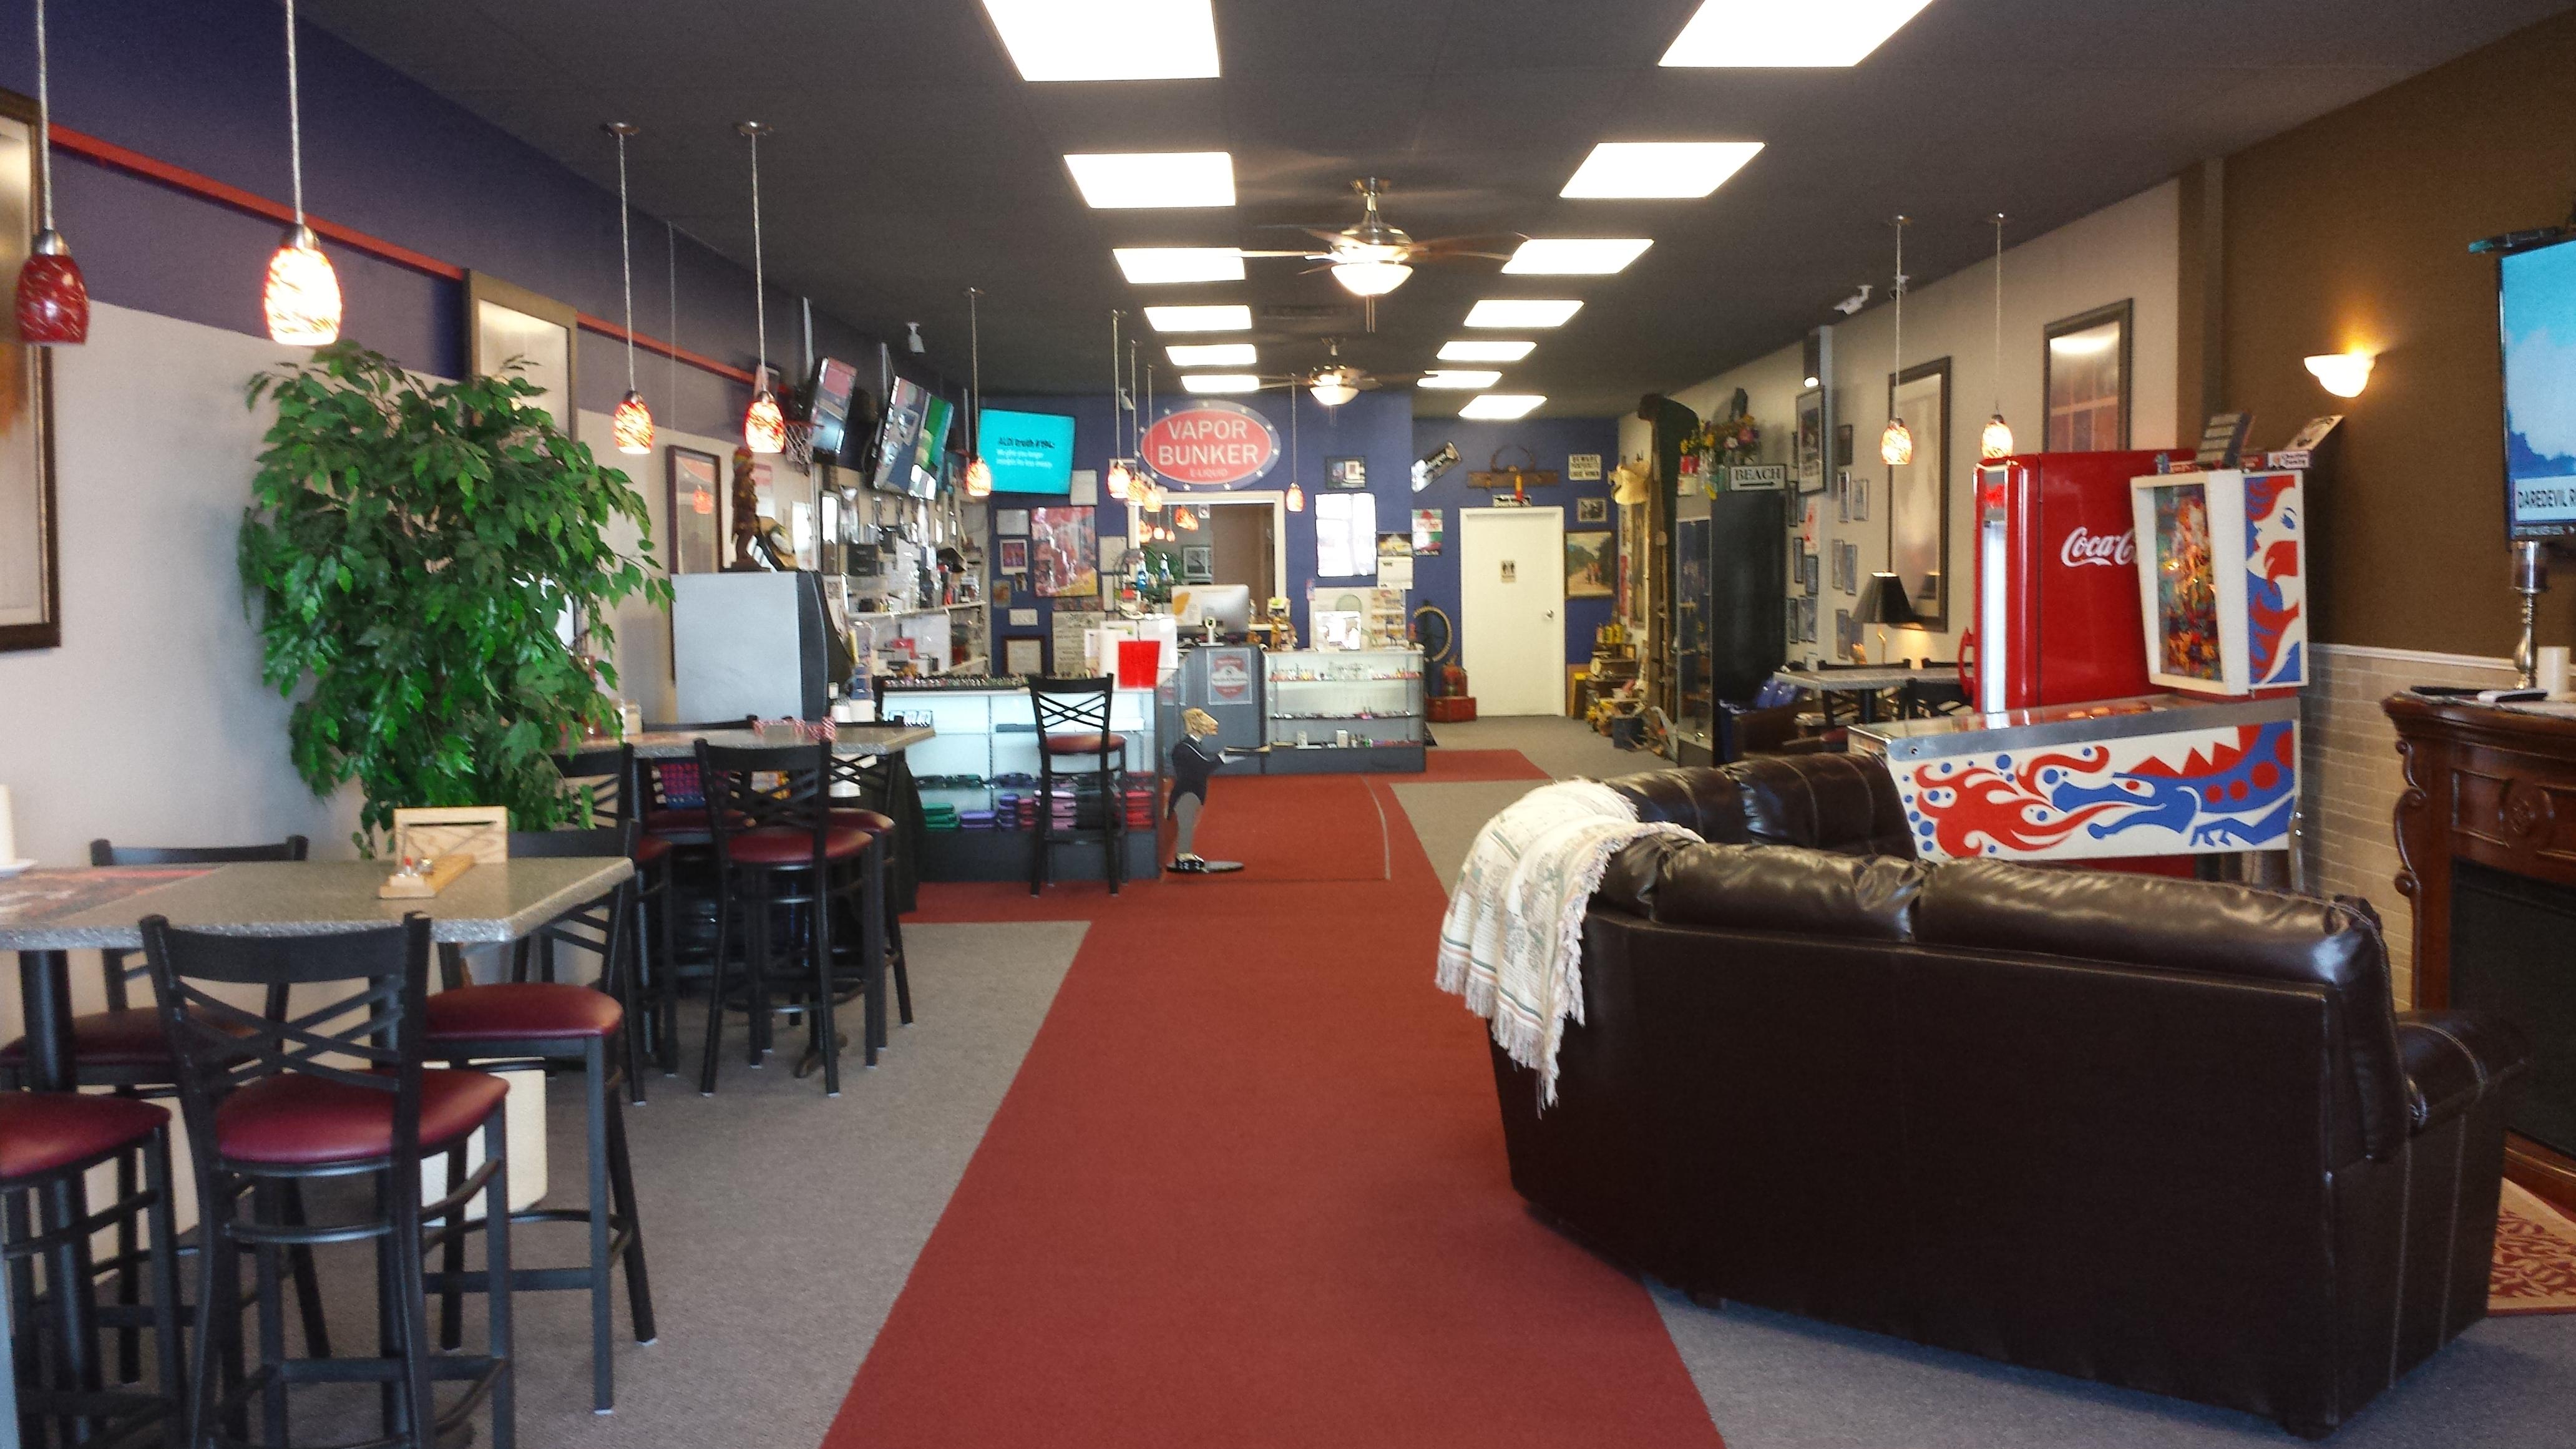 Vapor Bunker Store In Robbinsdale, MN